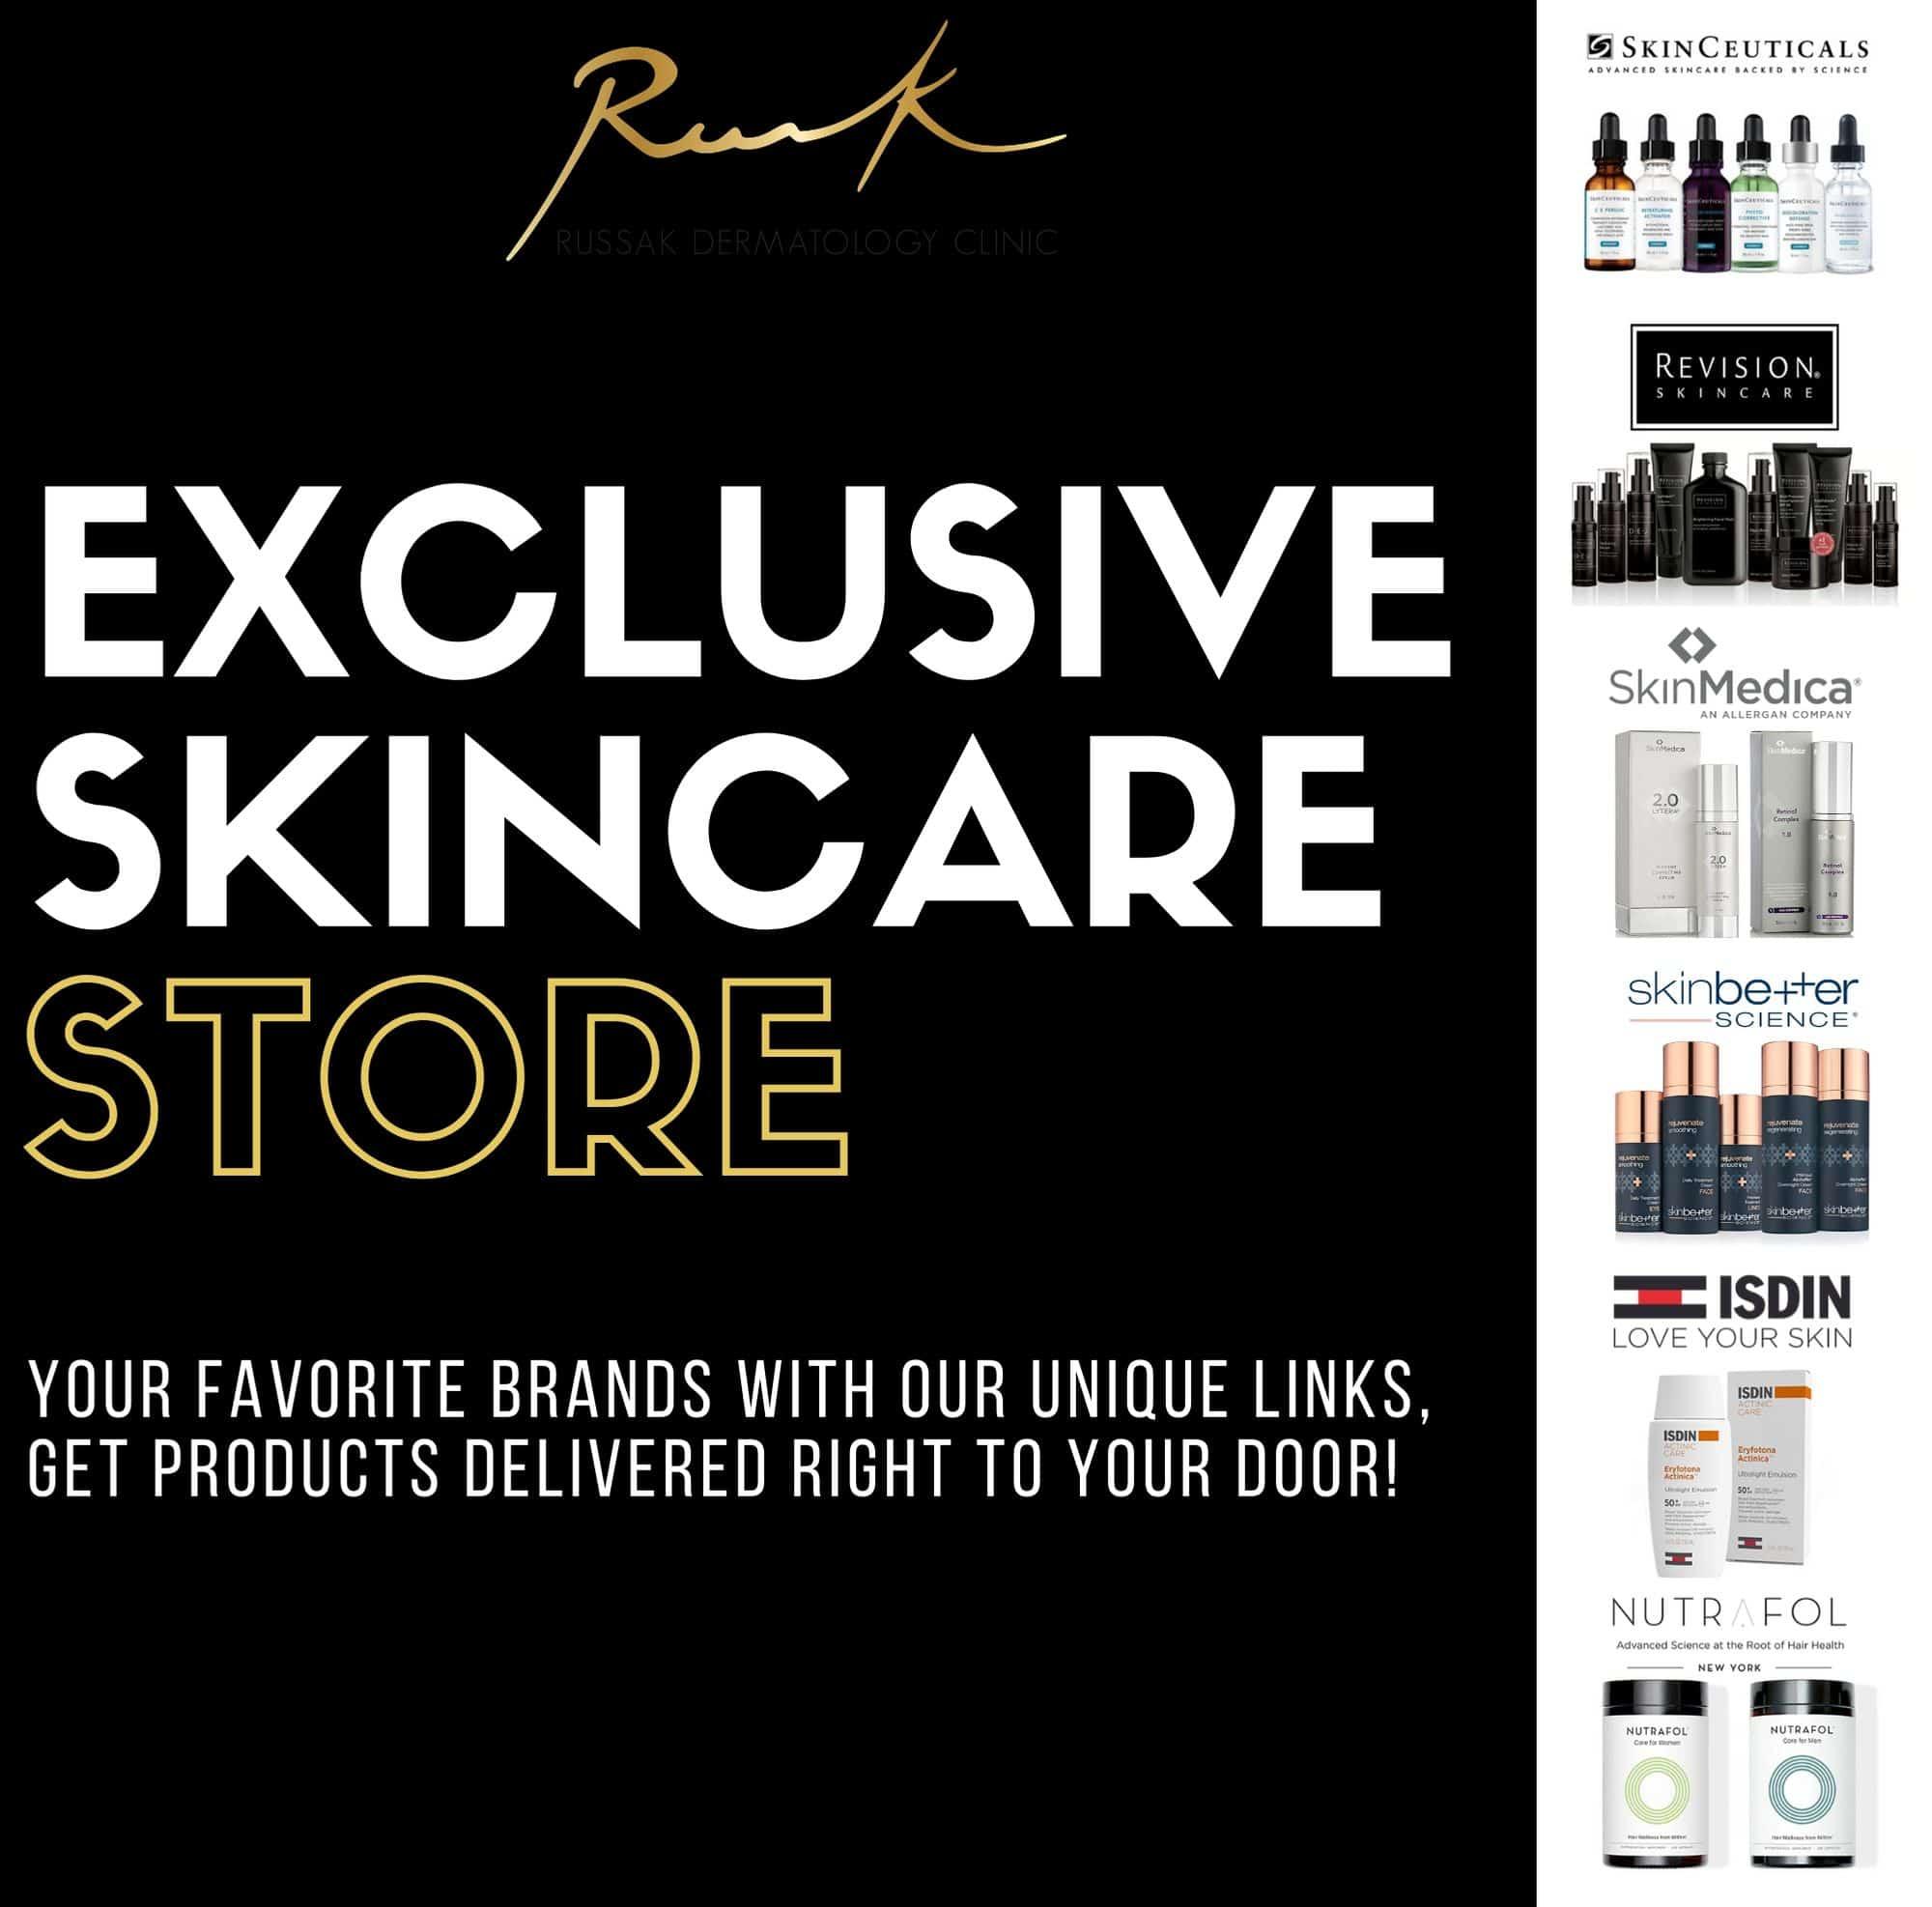 Exclusive Skincare Store